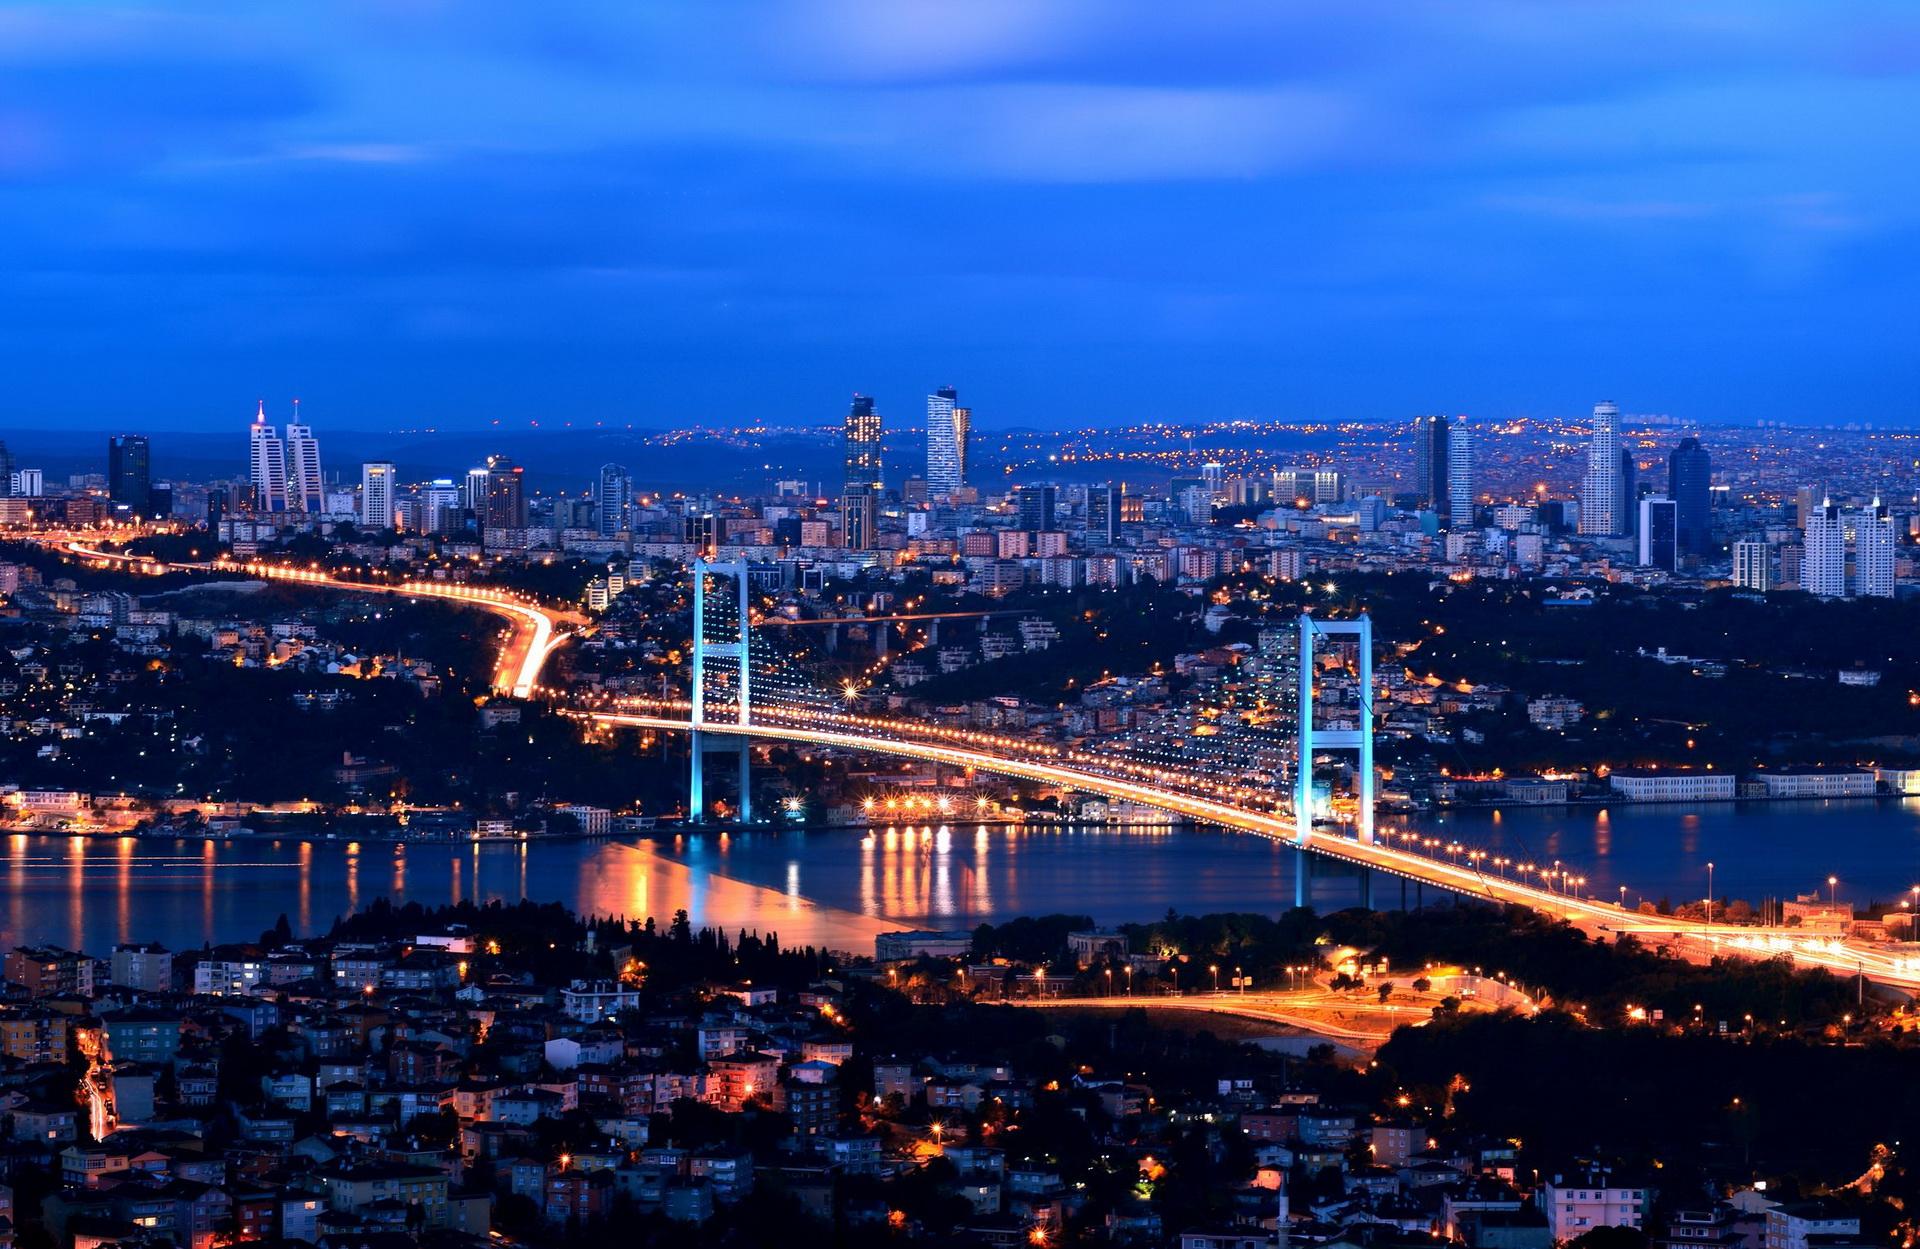 Super Reducere City Break Istanbul din Cluj Ianuarie - Februarie 3 nopti la de la 279 Euro/persoana!